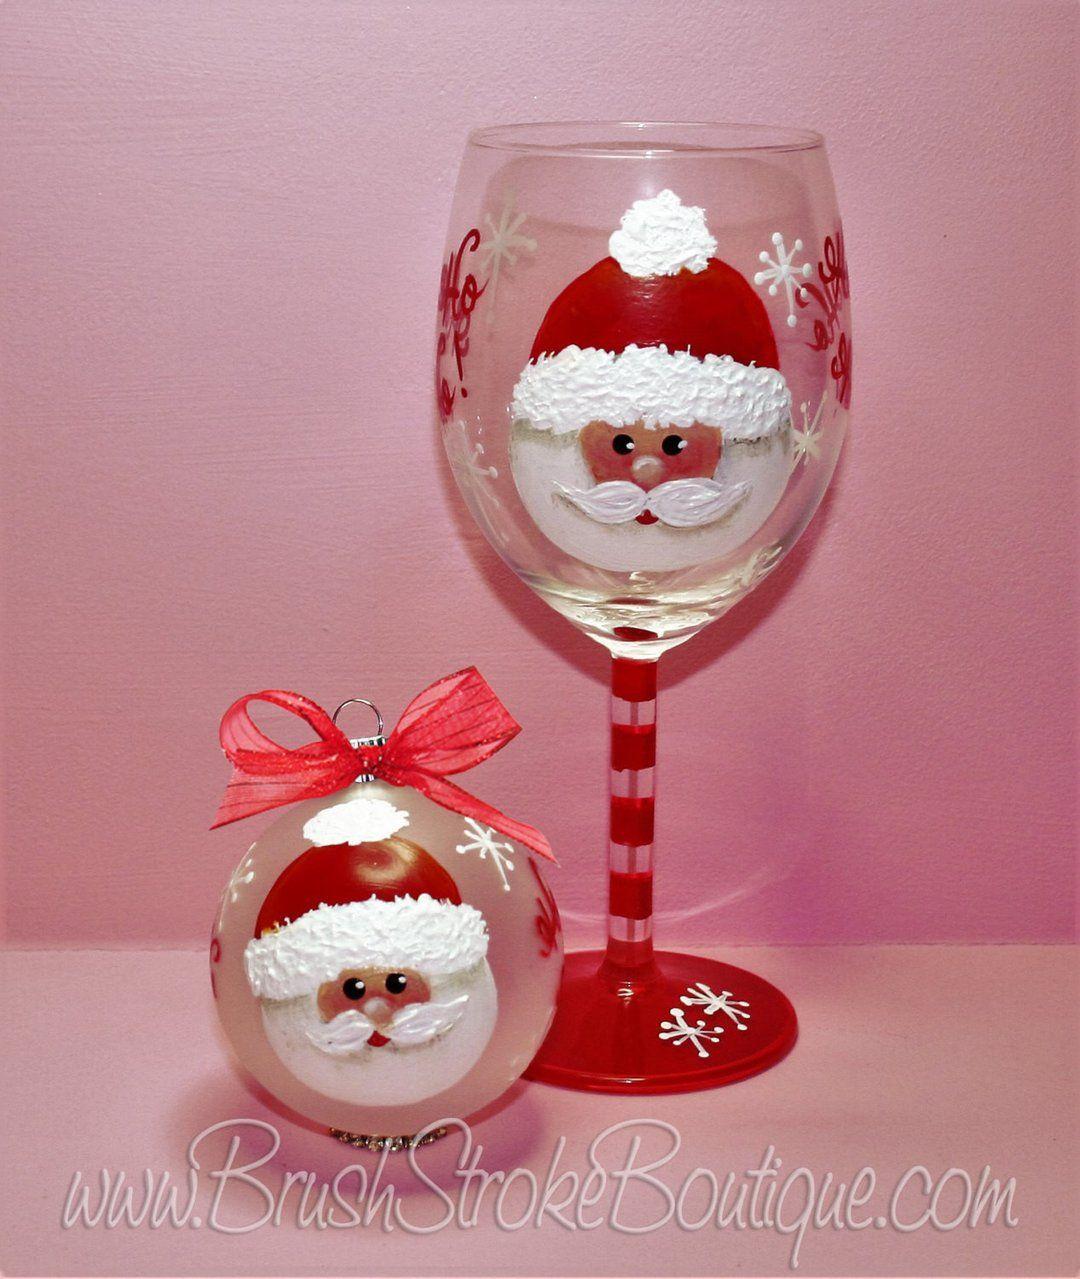 Hand Painted Wine Glass Ornament Set Santa Face Original Designs By Cathy Kraemer Christmas Wine Glasses Wine Glass Candle Holder Decorated Wine Glasses